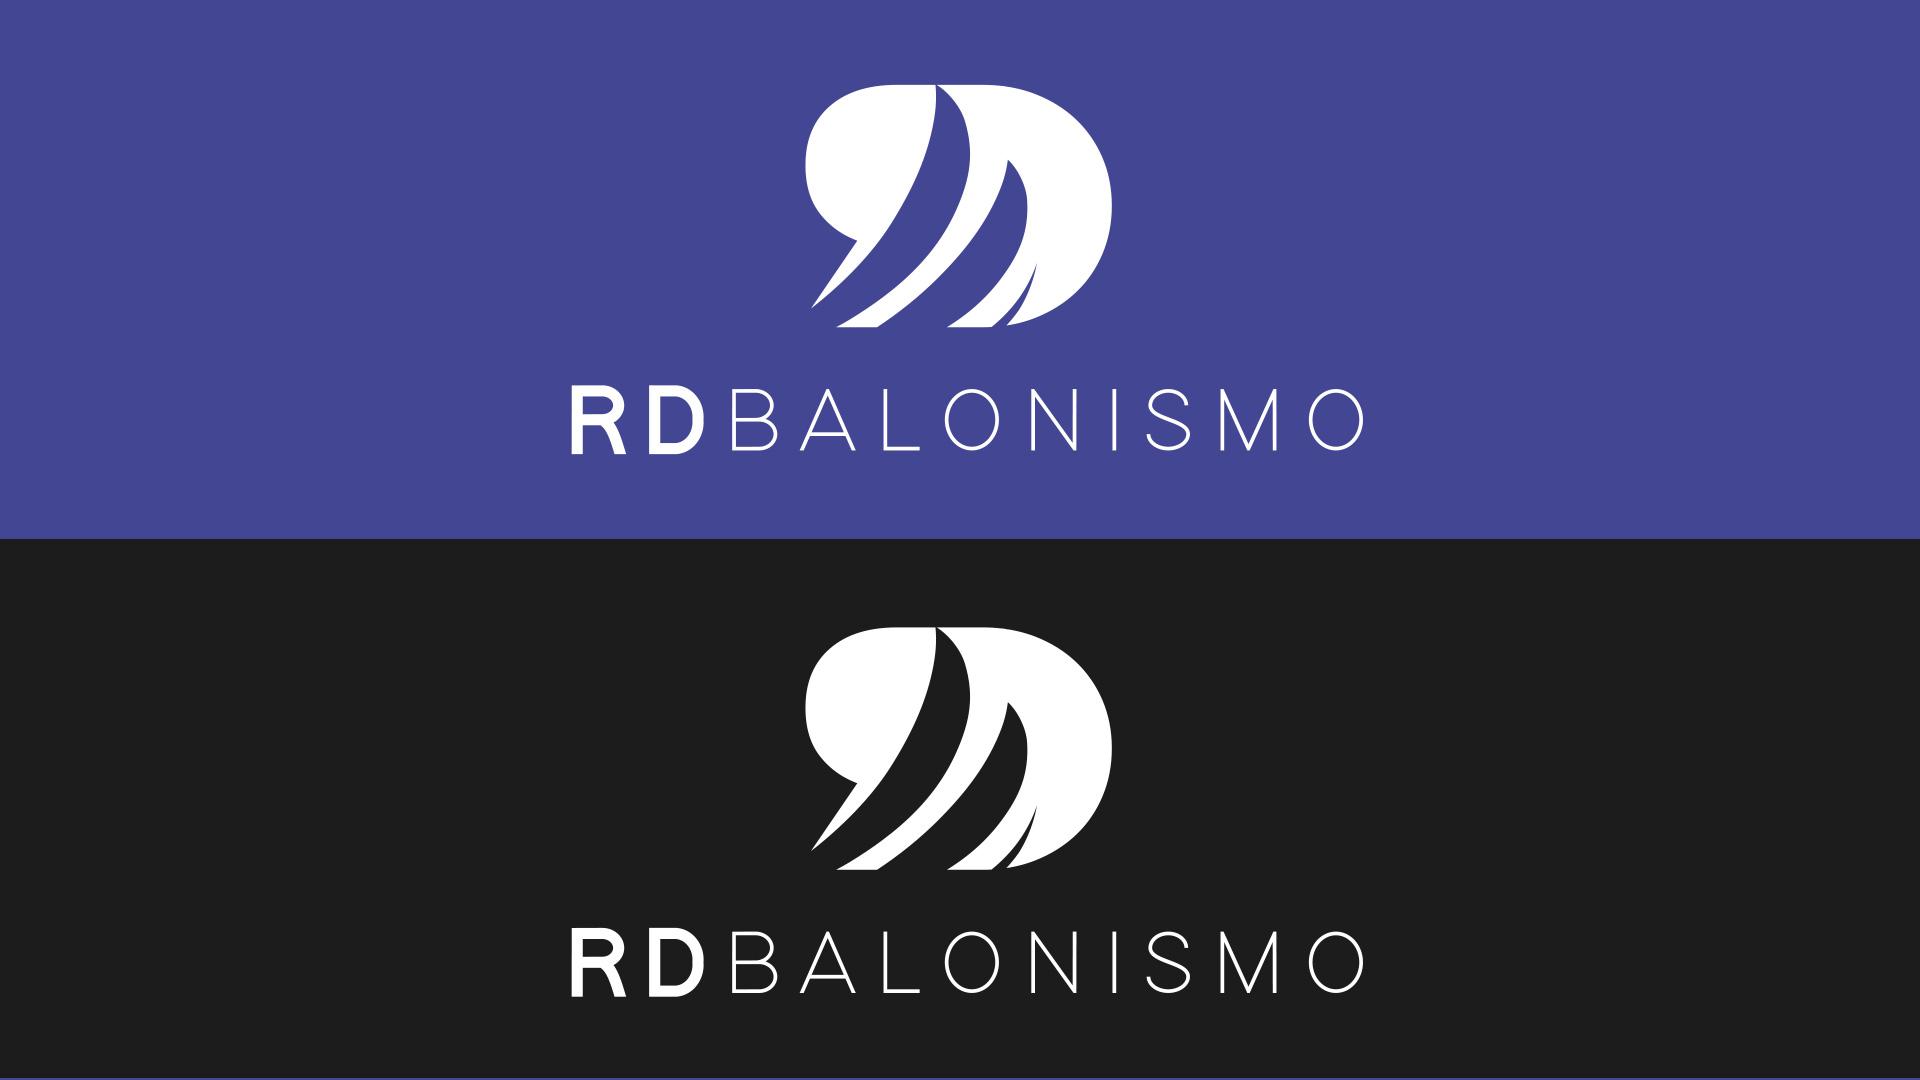 RD BALONISMO